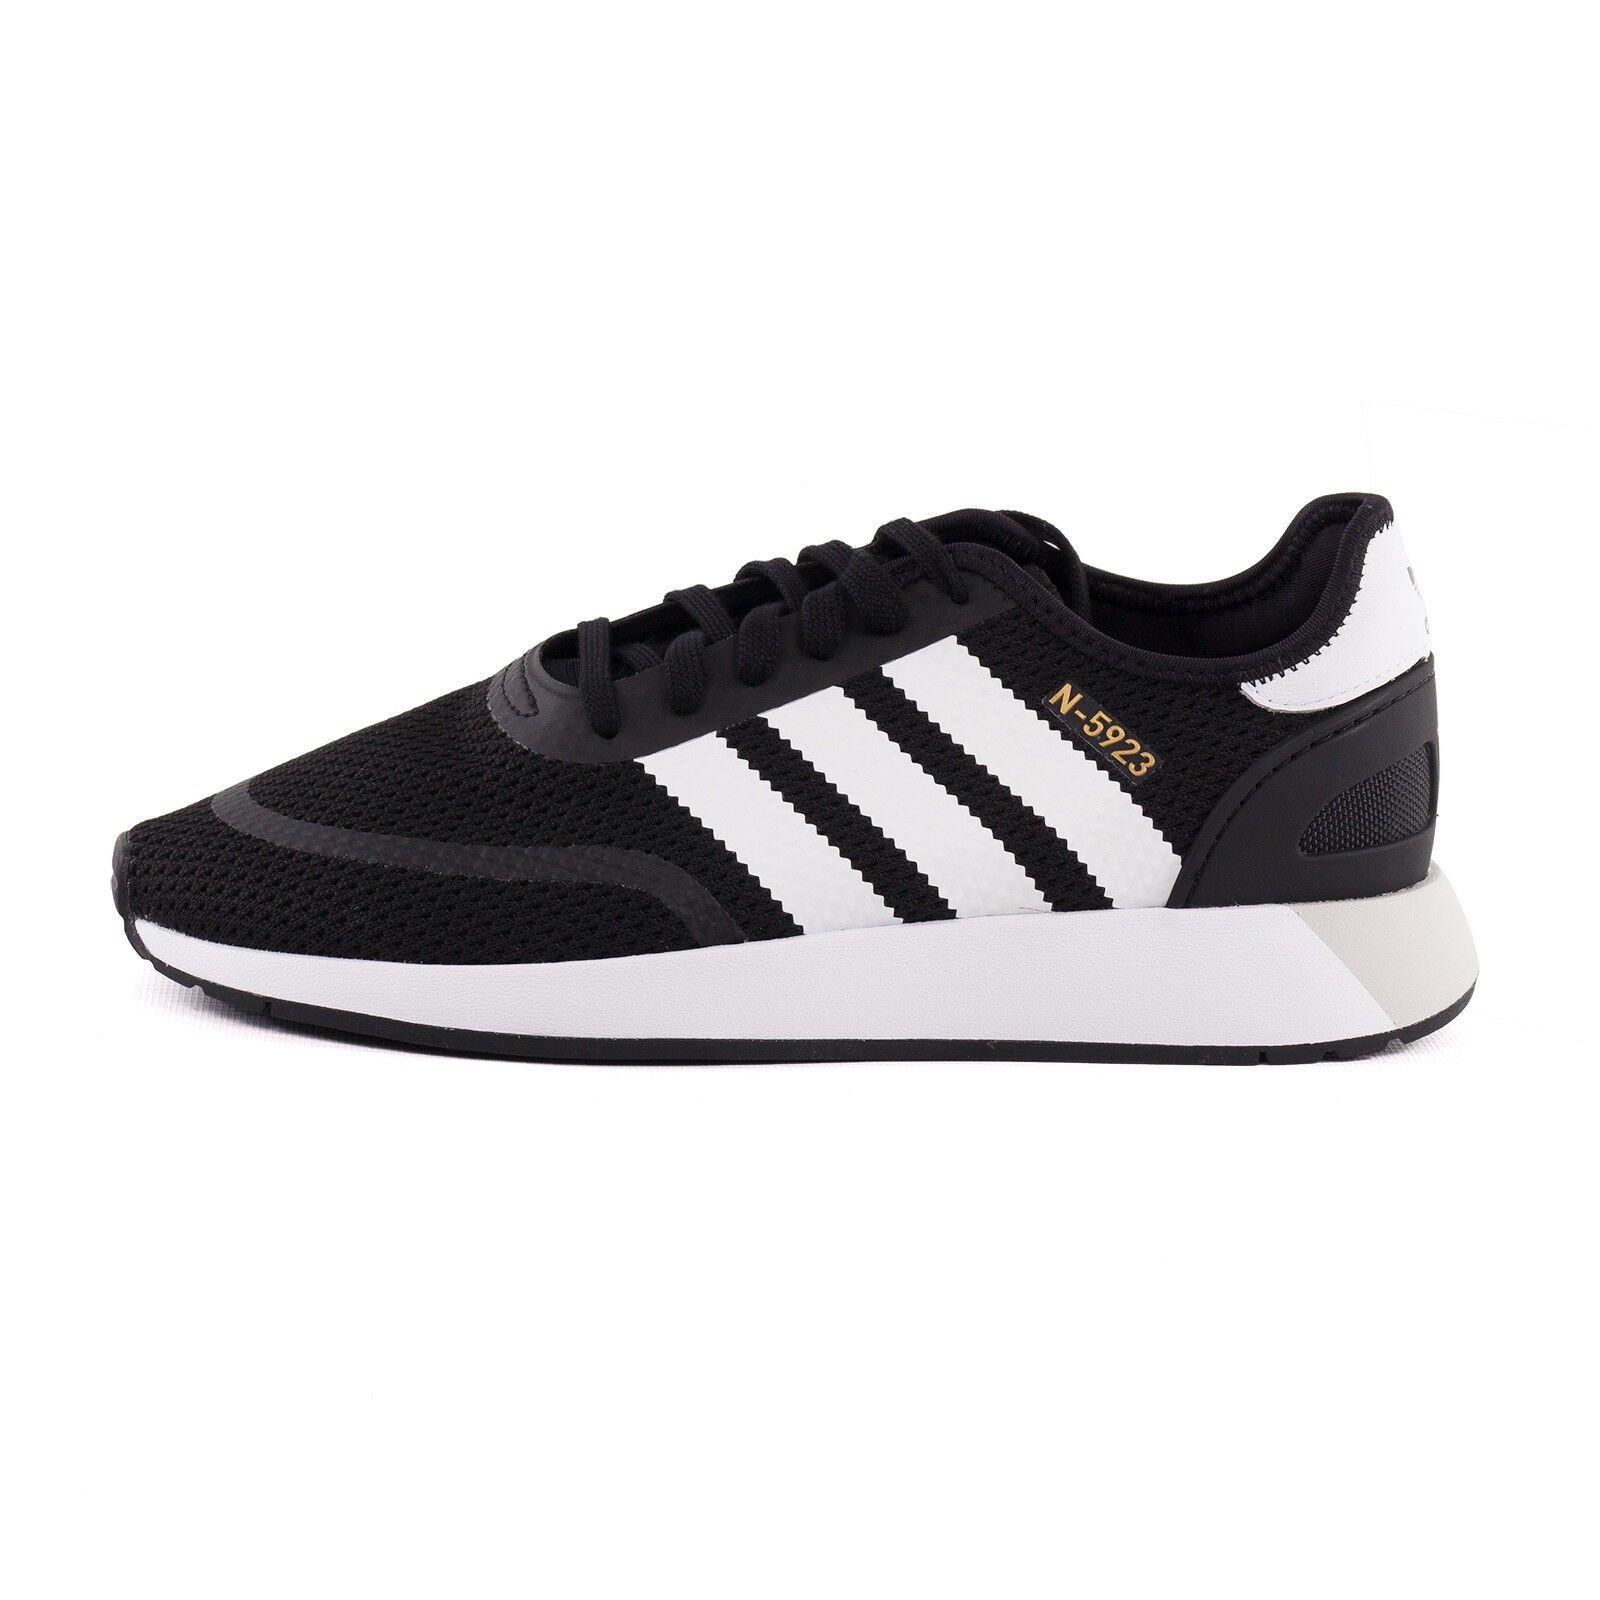 Adidas N-5923 Schuhe unisex Sneaker schwarz weiss 51338